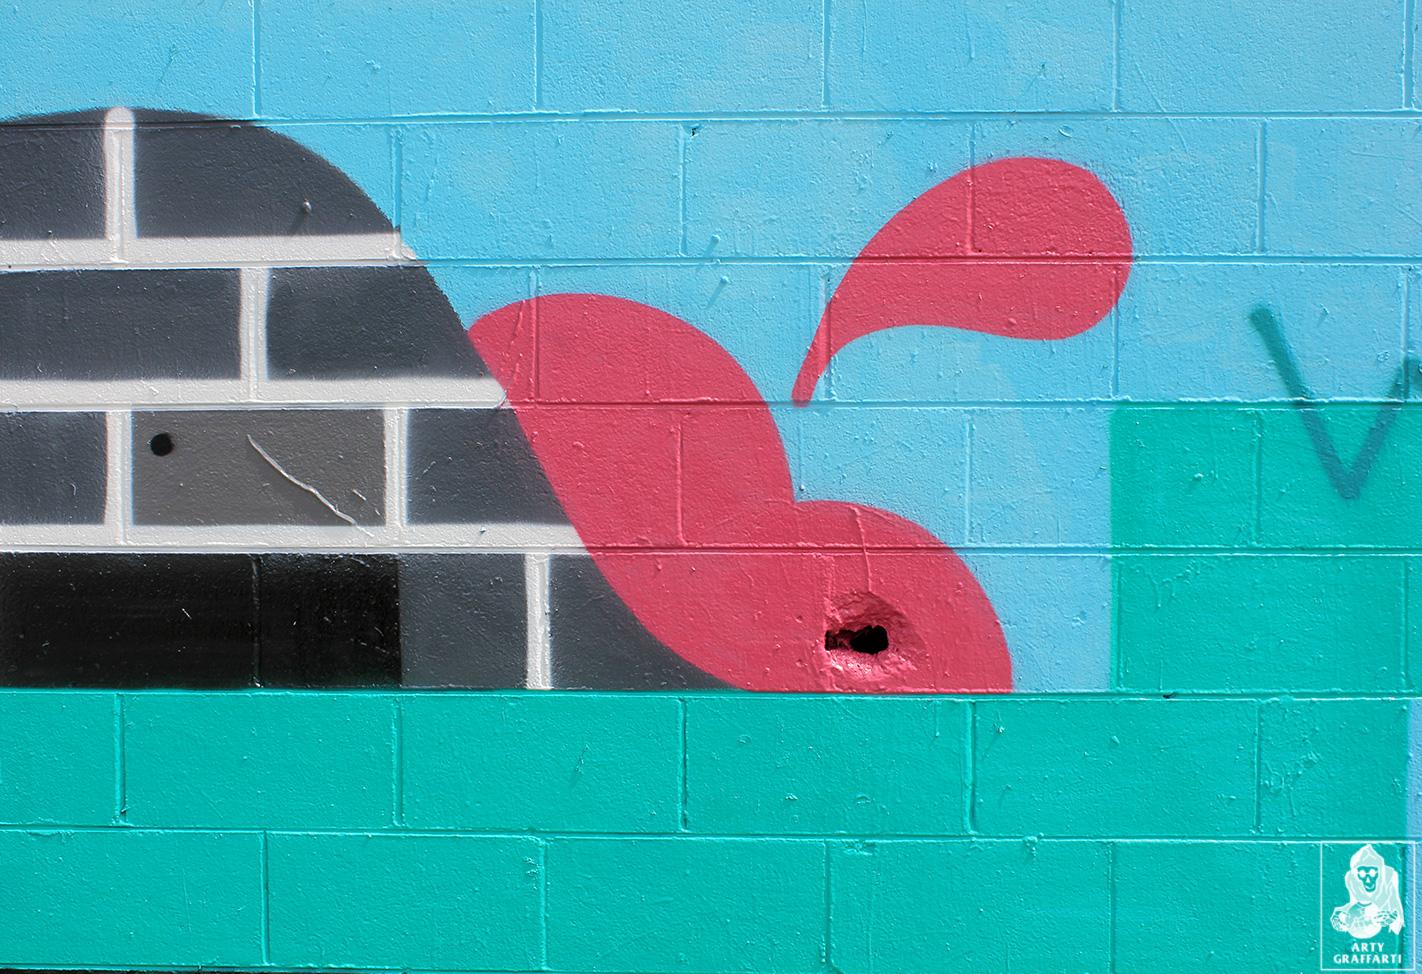 OG23-Preston-Graffiti-Melbourne-Arty-Graffarti3